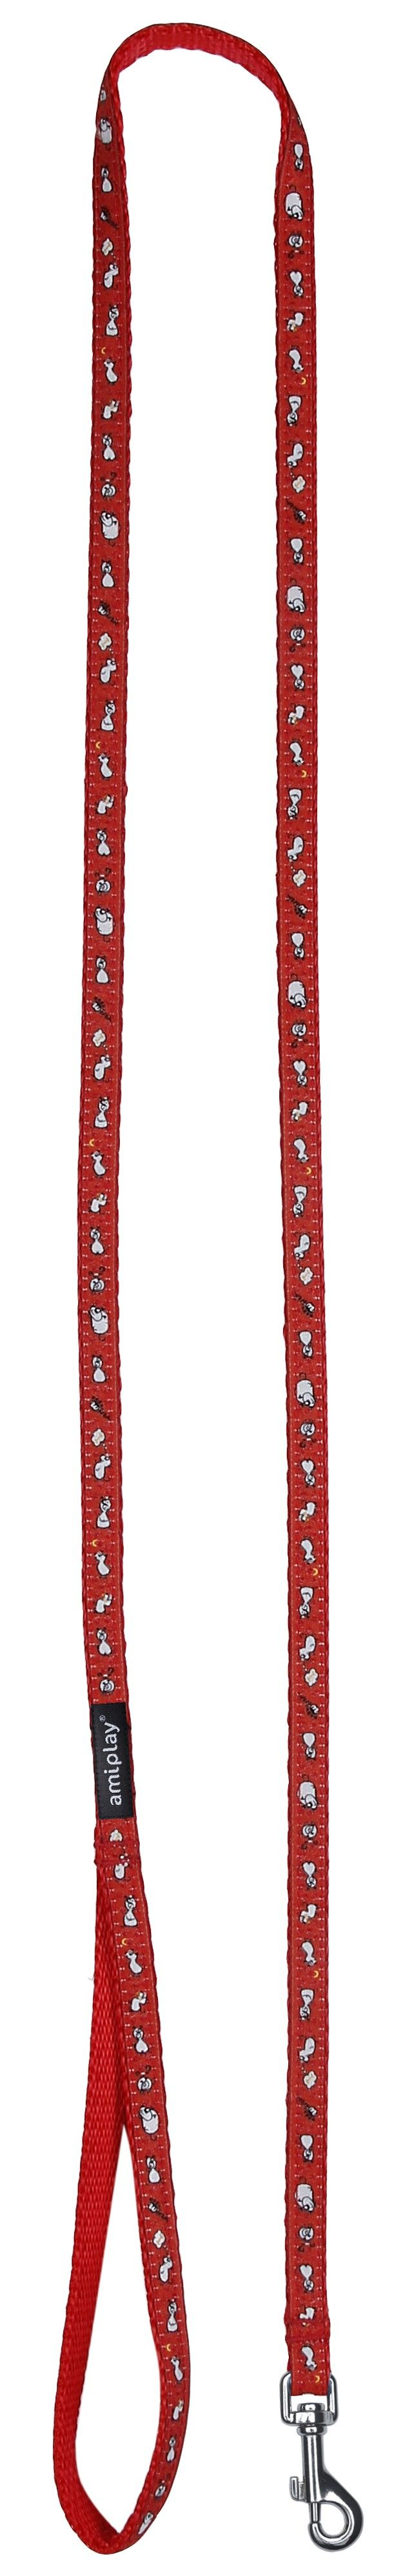 Amiplay Wink leash red